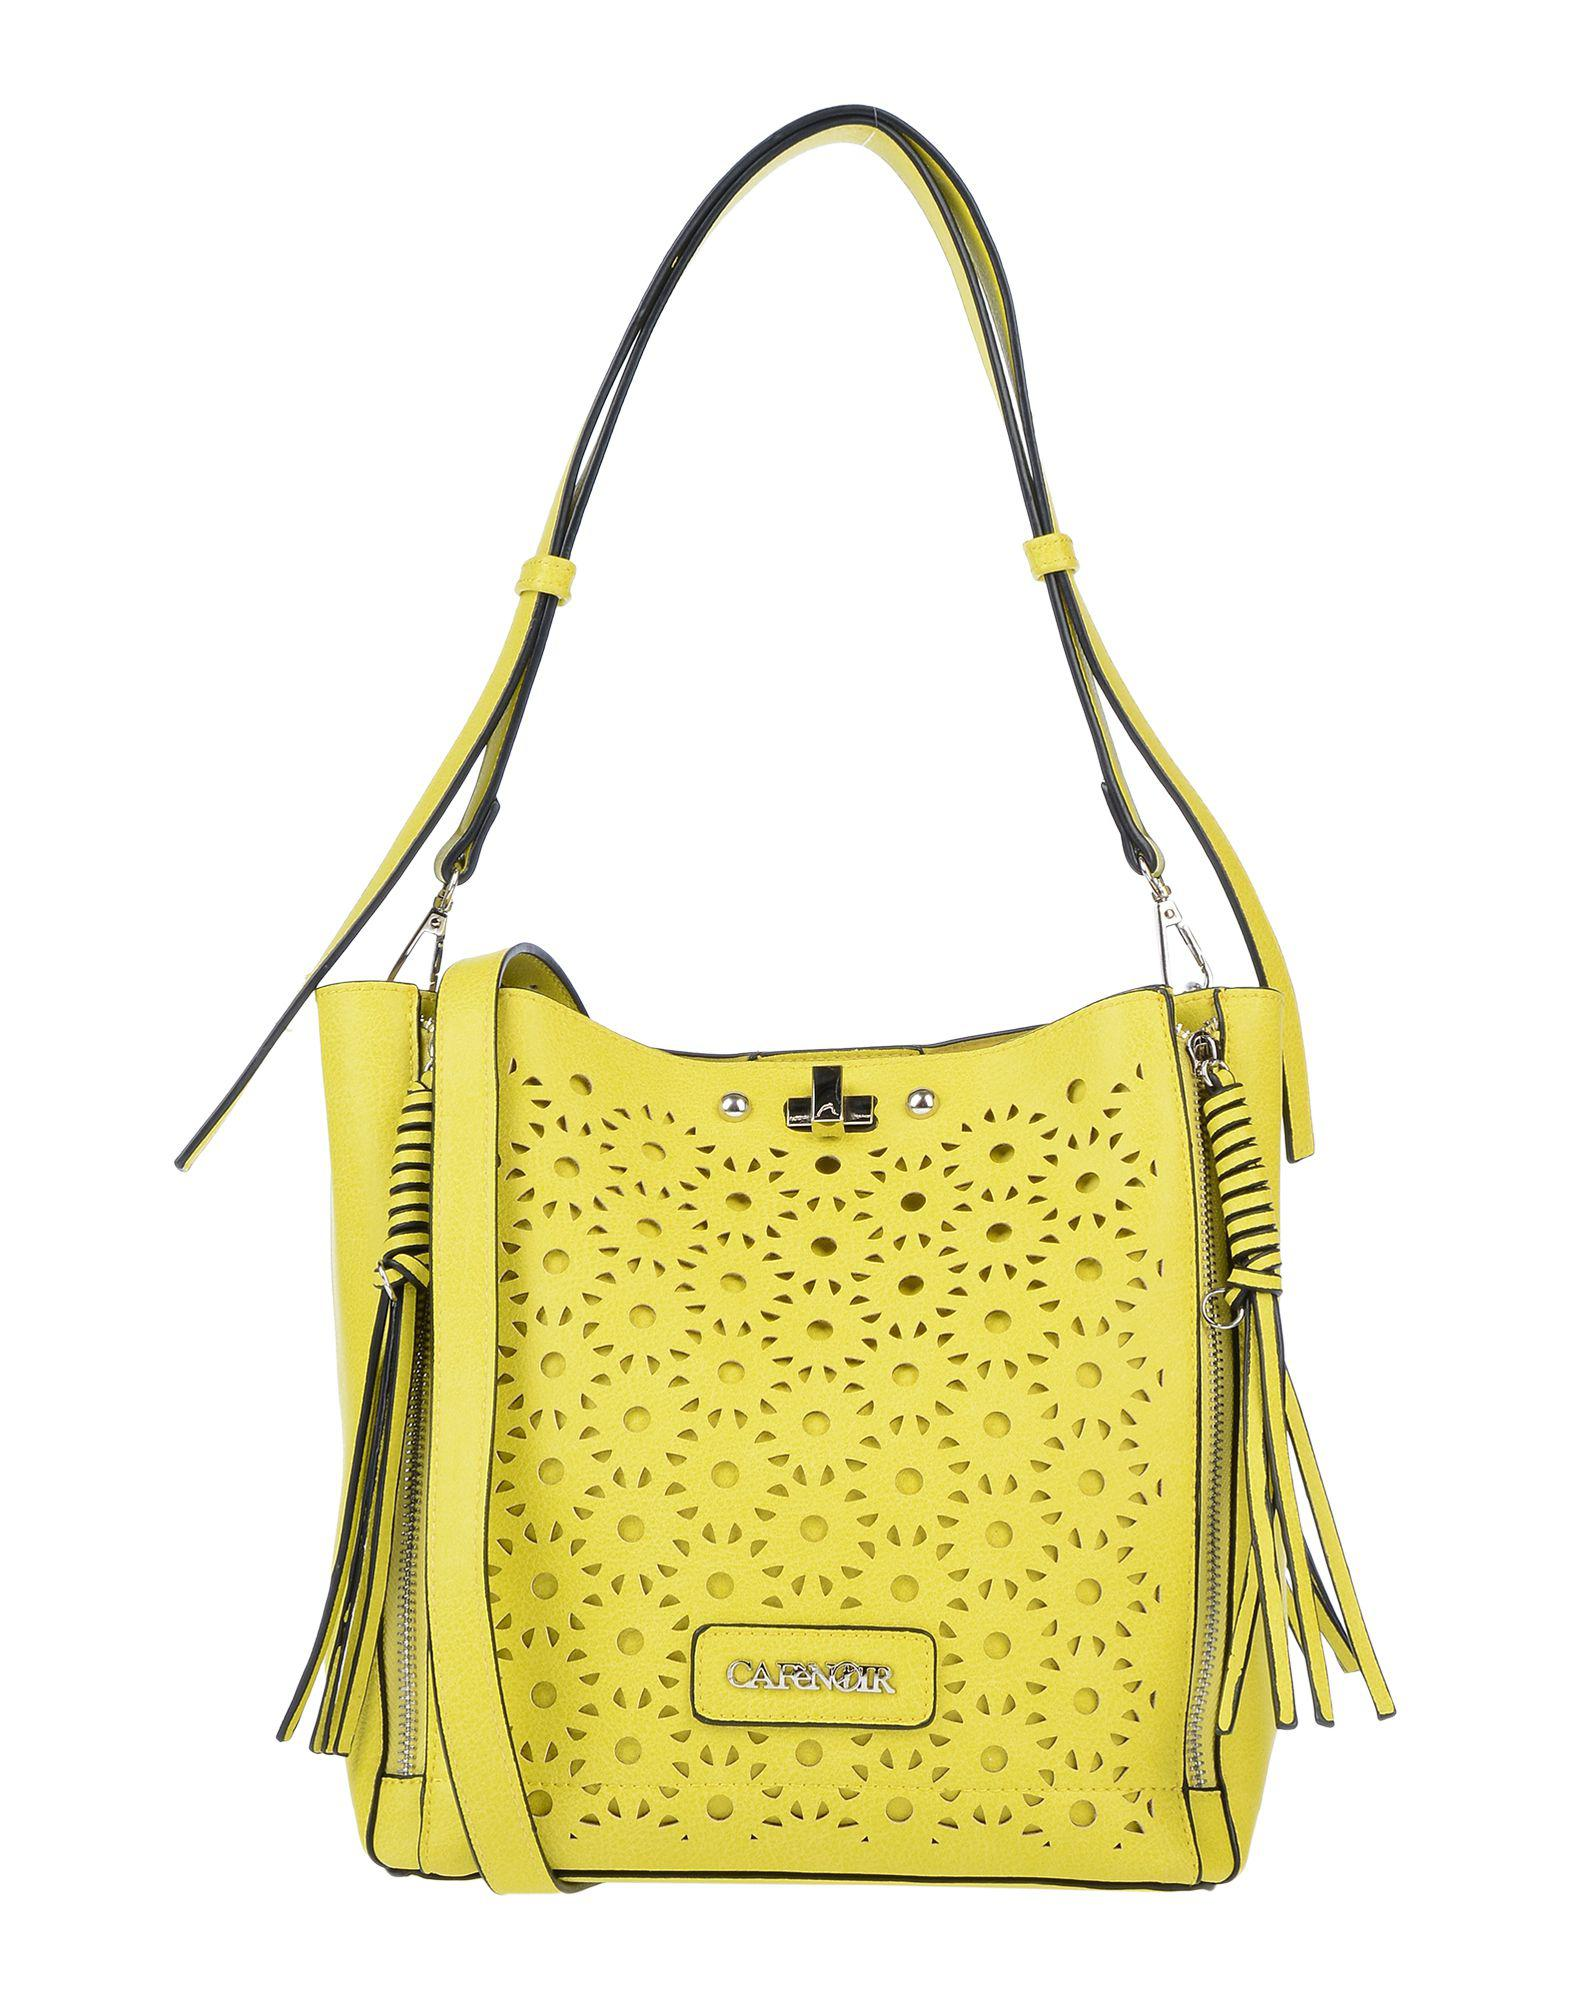 Lyst - Cafenoir Shoulder Bag in Yellow 34d107f9f0c